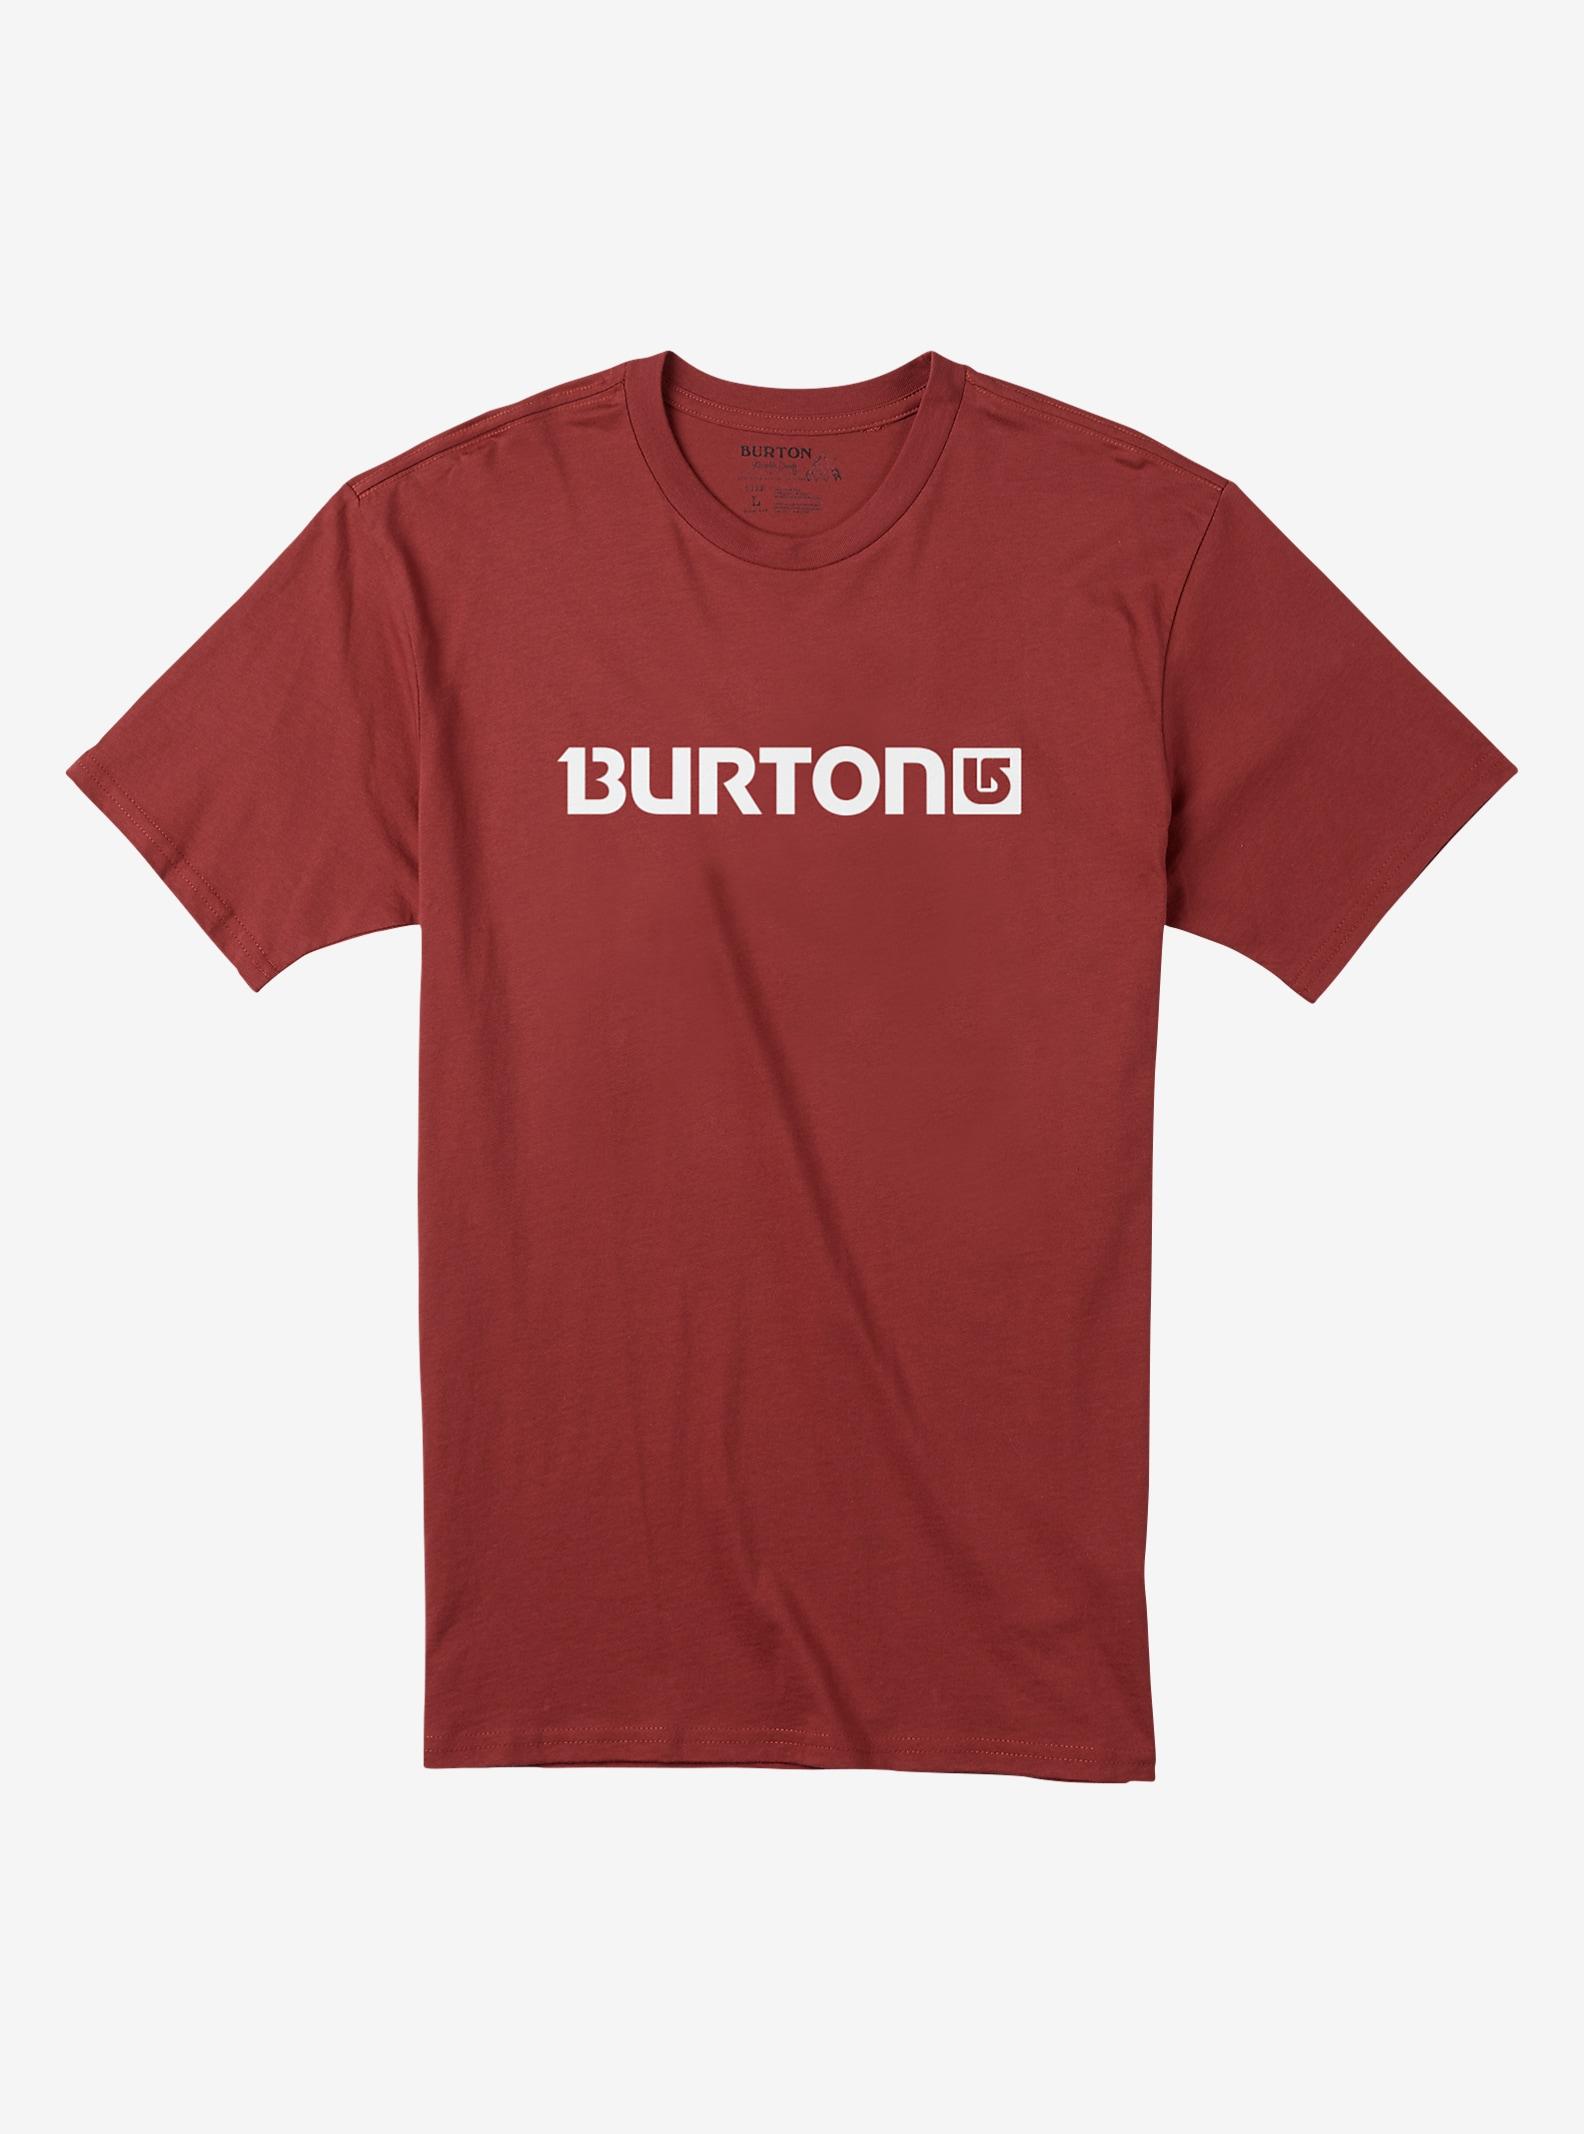 Burton Logo Horizontal Short Sleeve T Shirt shown in Brick Red